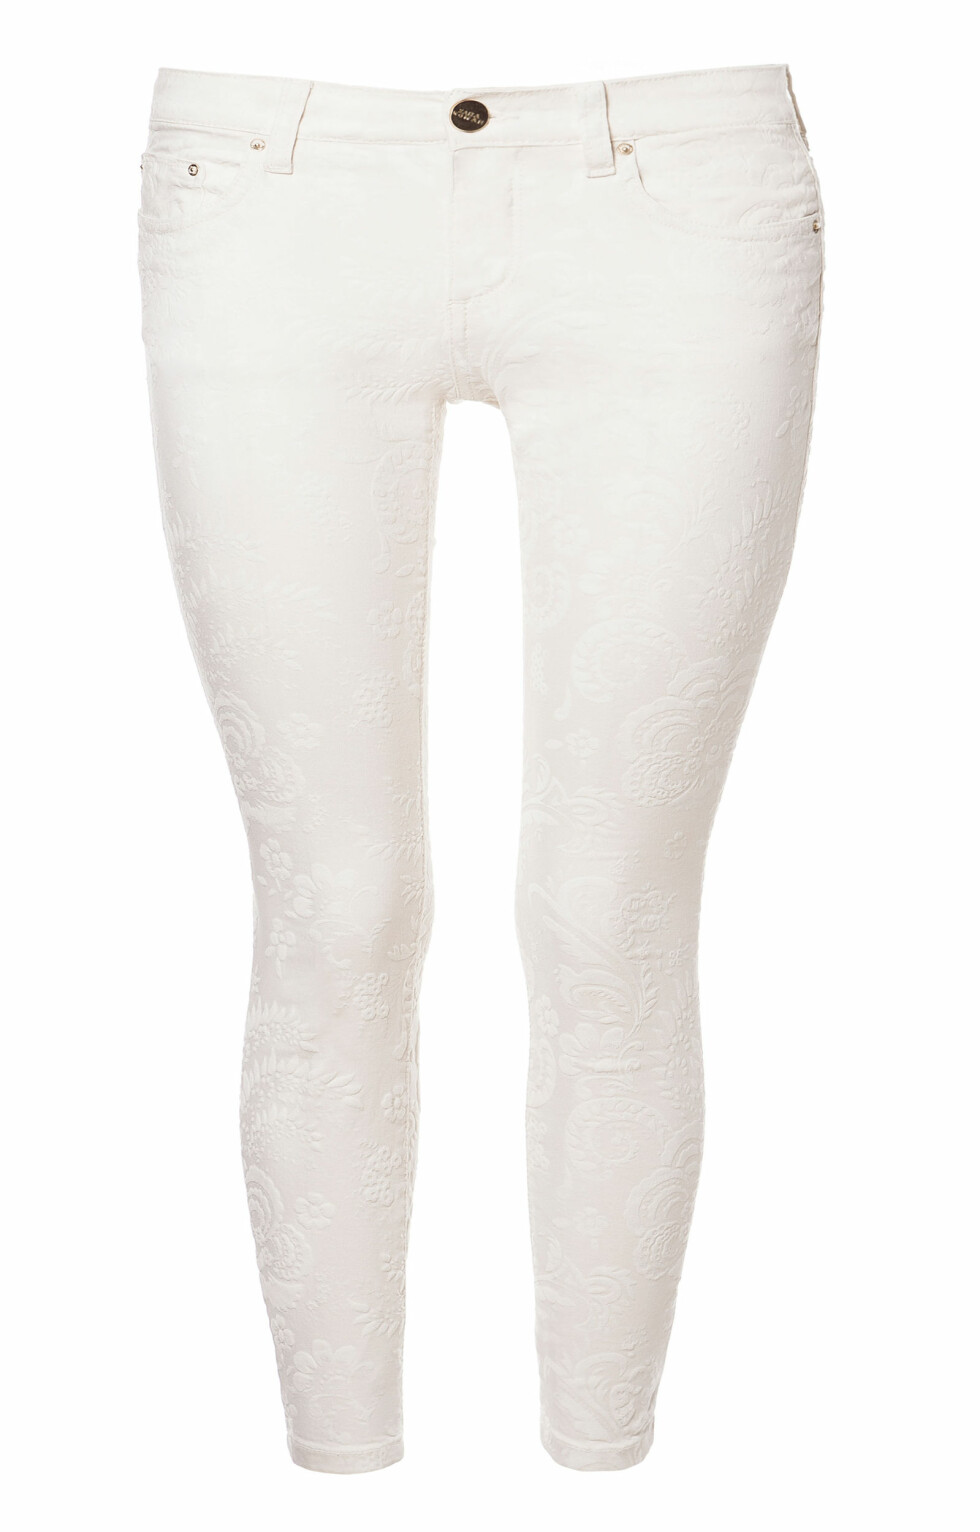 Mønstrete skinny-jeans (kr 560, Zara). Foto: Produsentene